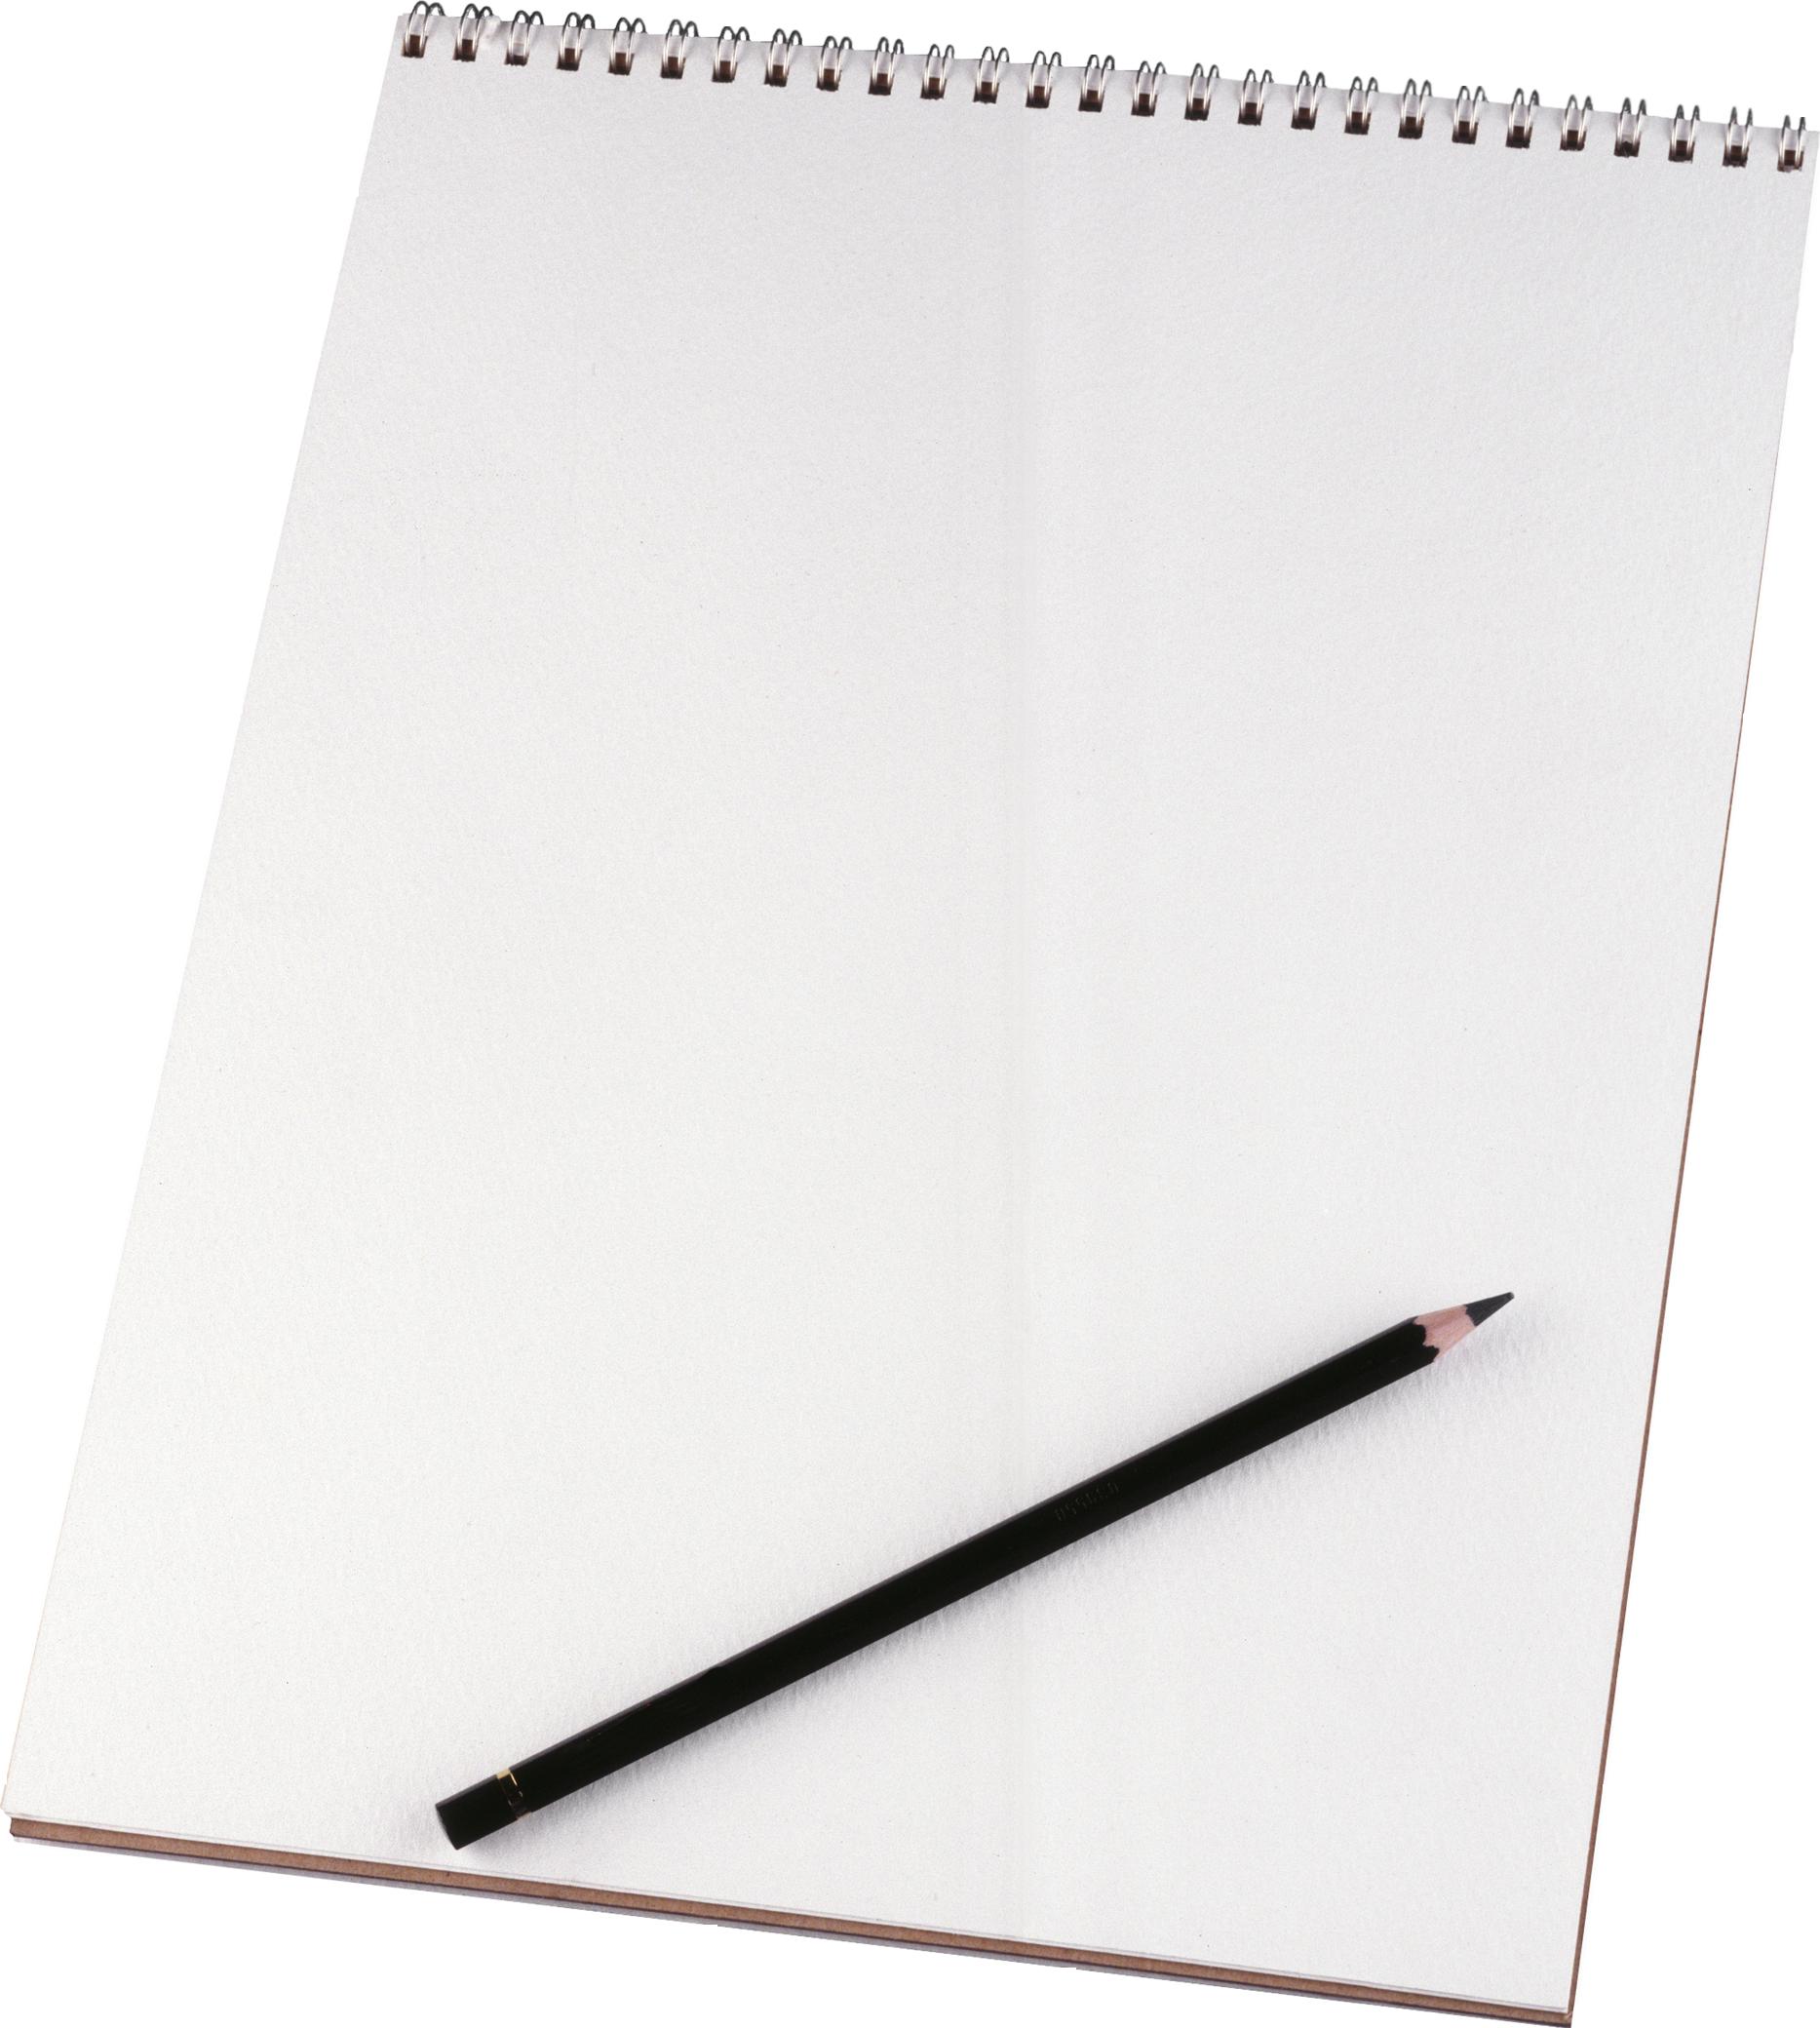 Paper sheet PNG images Download